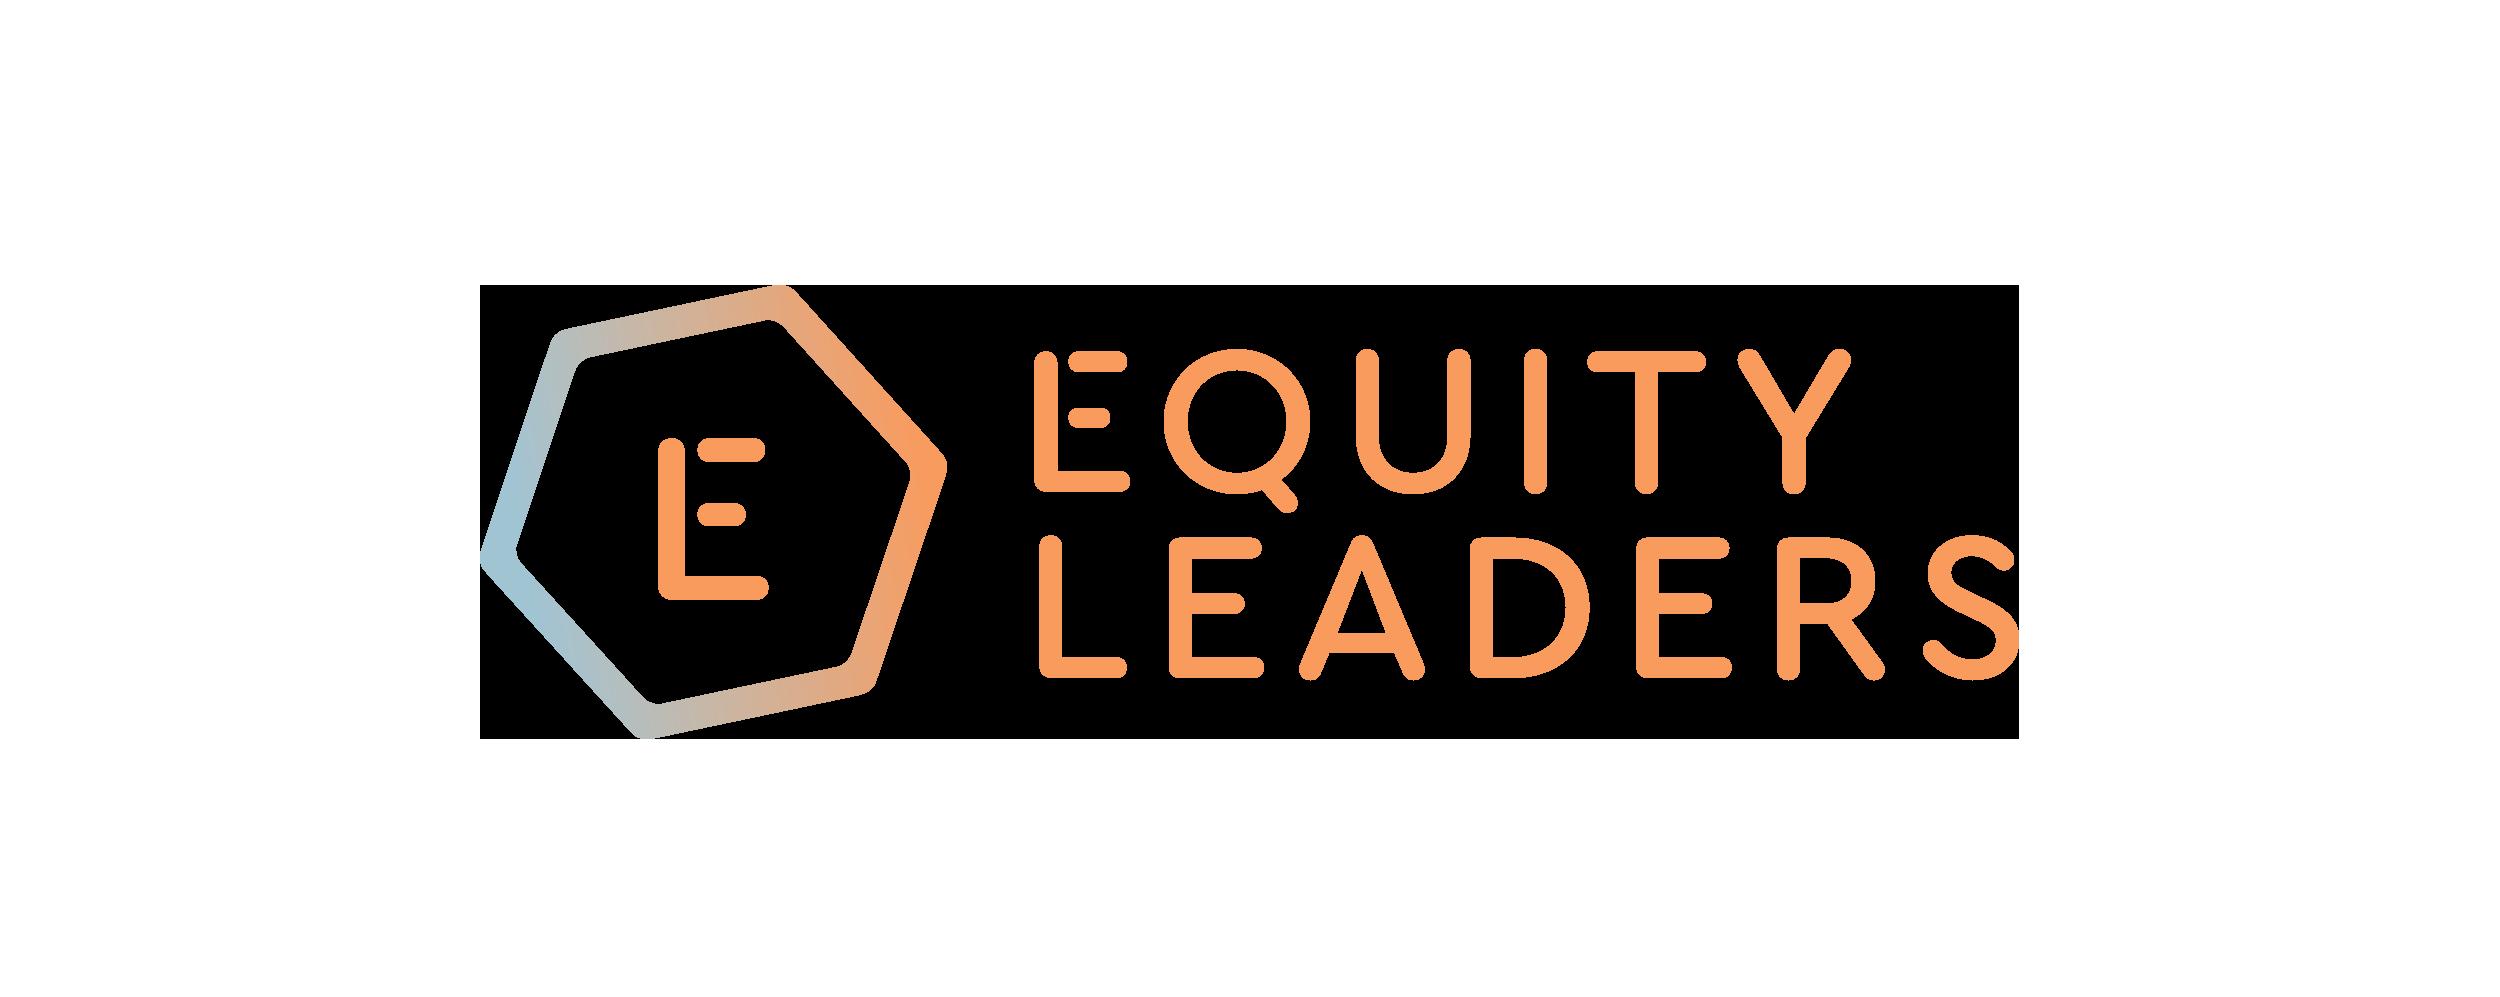 equityleaders-logo-2.png